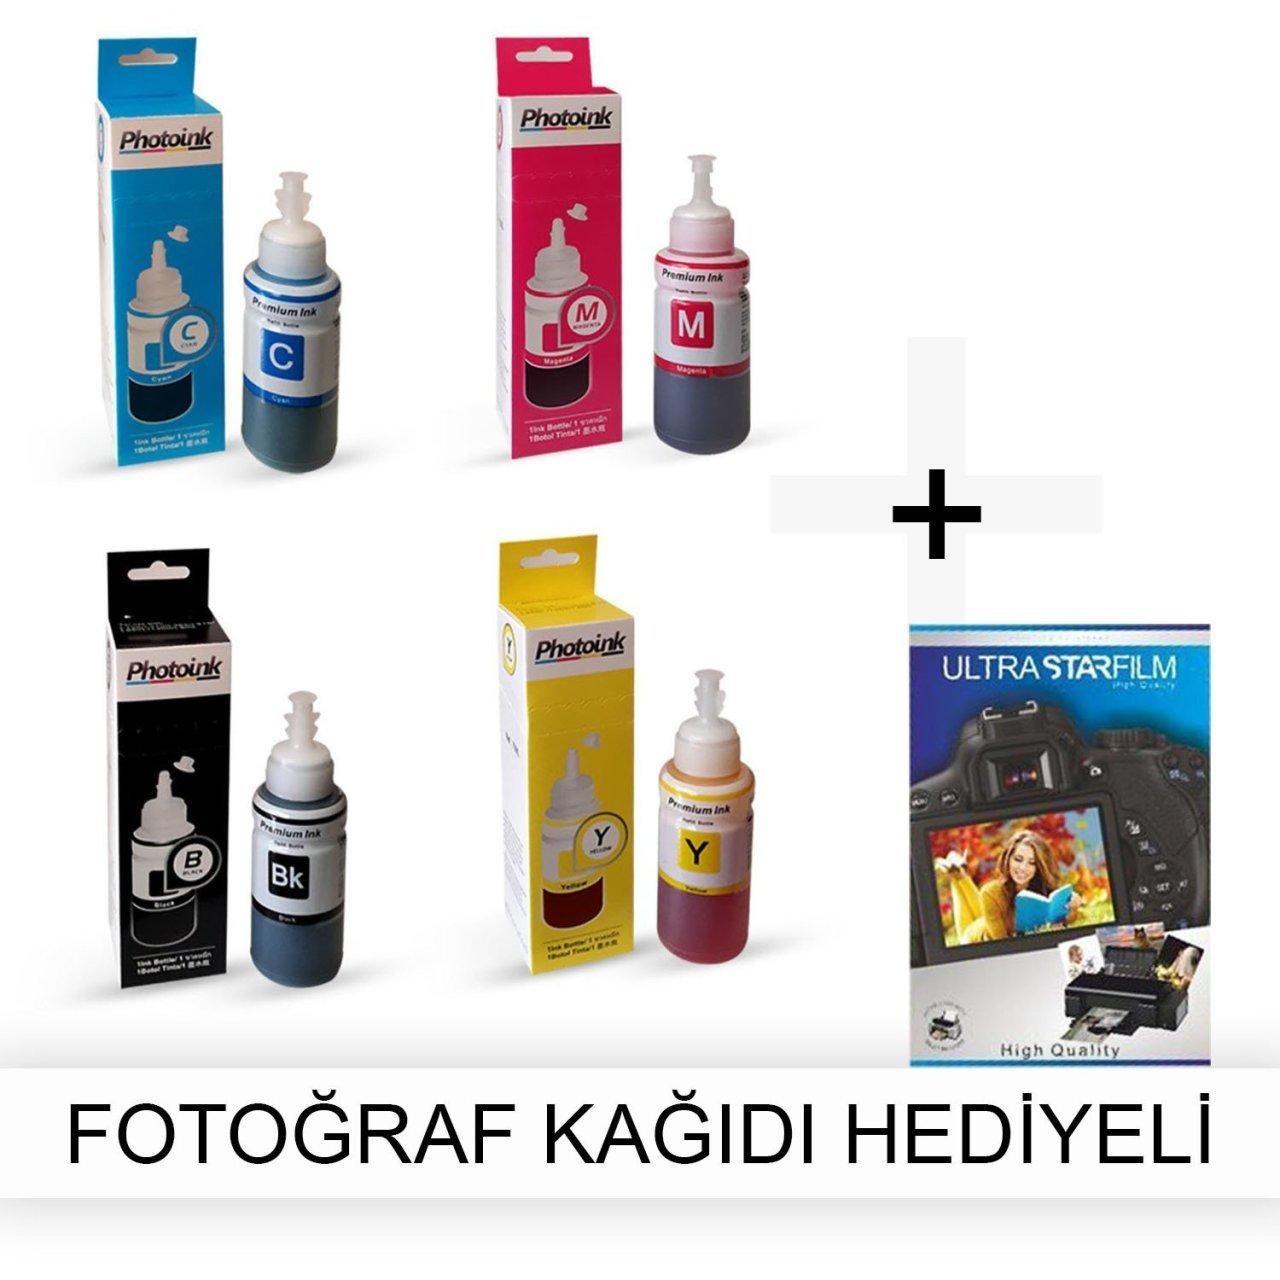 Epson EcoTank L320 1 traje de tinta fotográfica-papel fotográfico para regalo